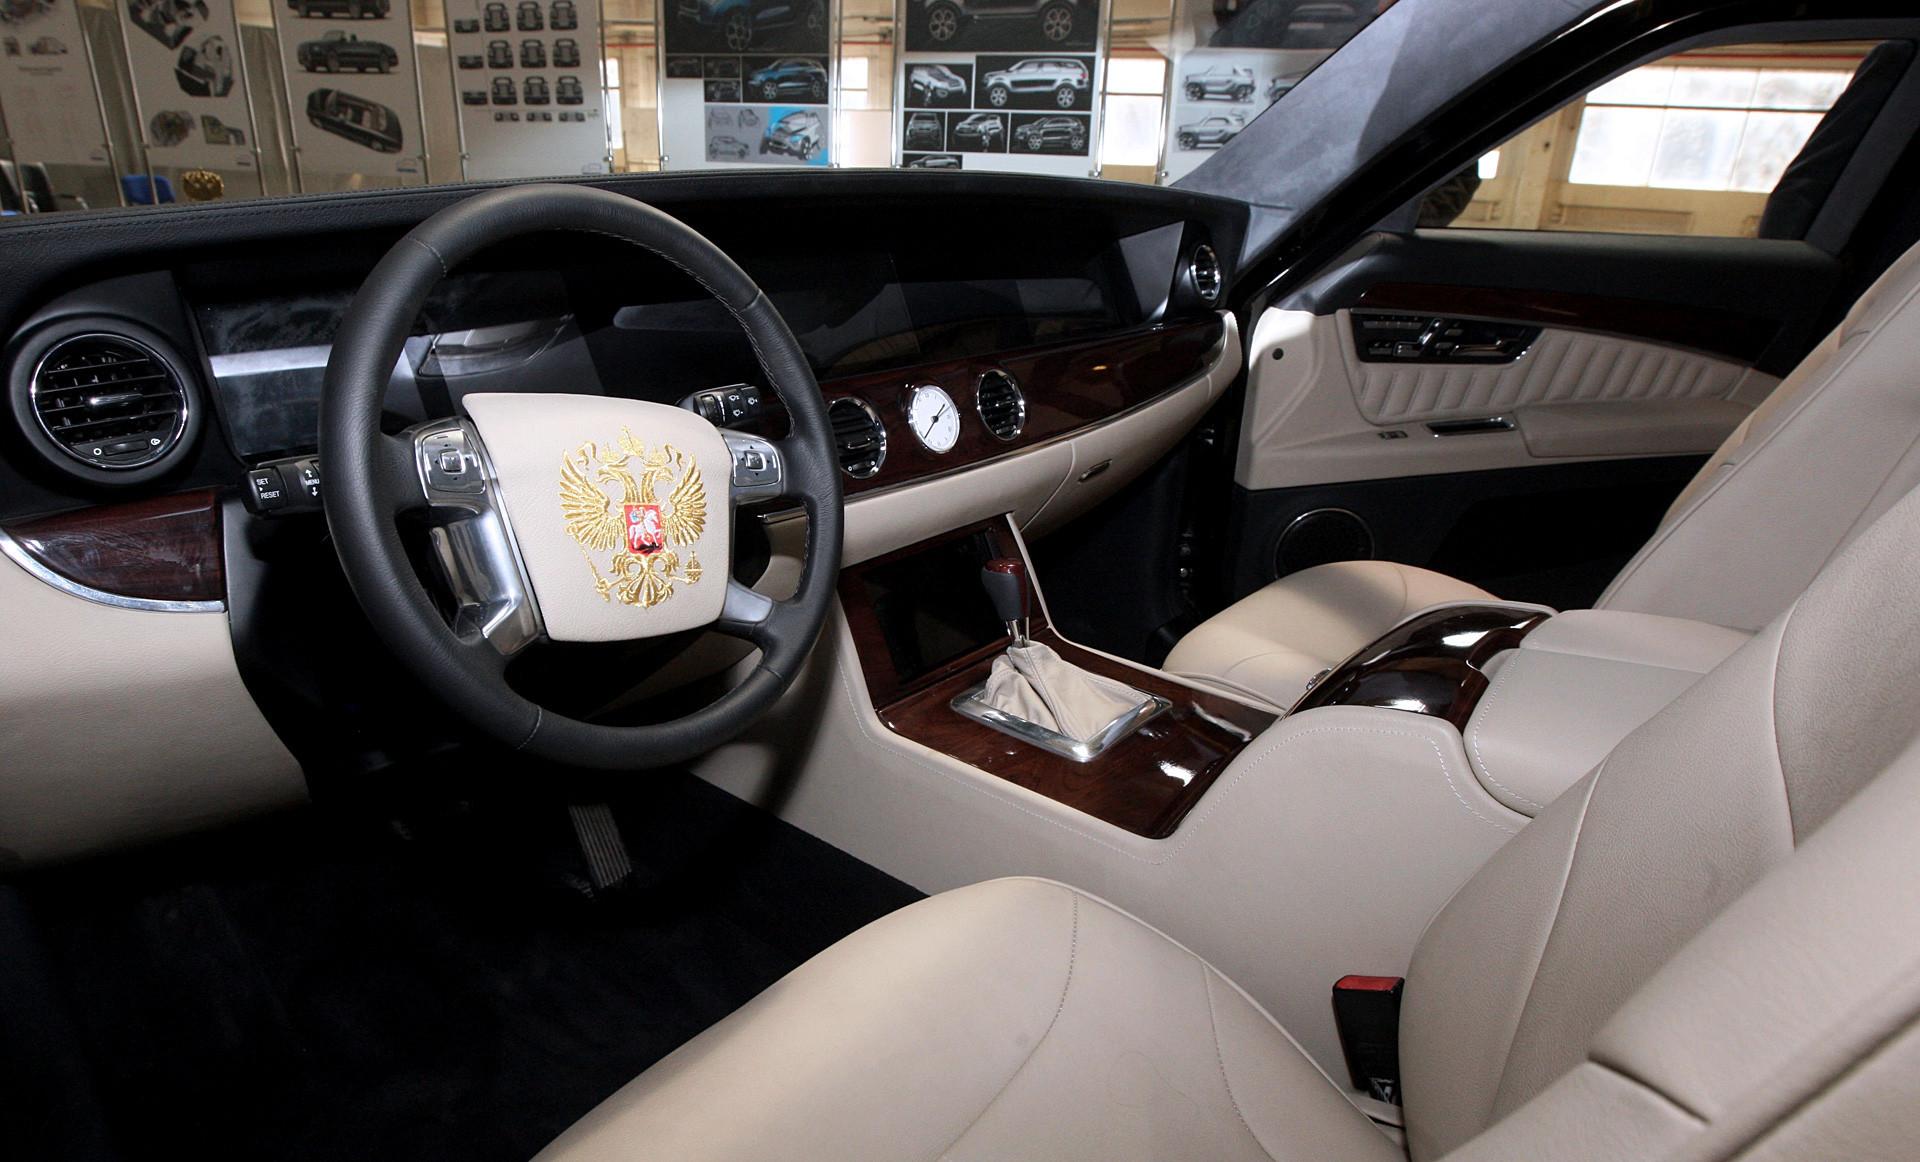 Interior mobil dari proyek Kortezh.